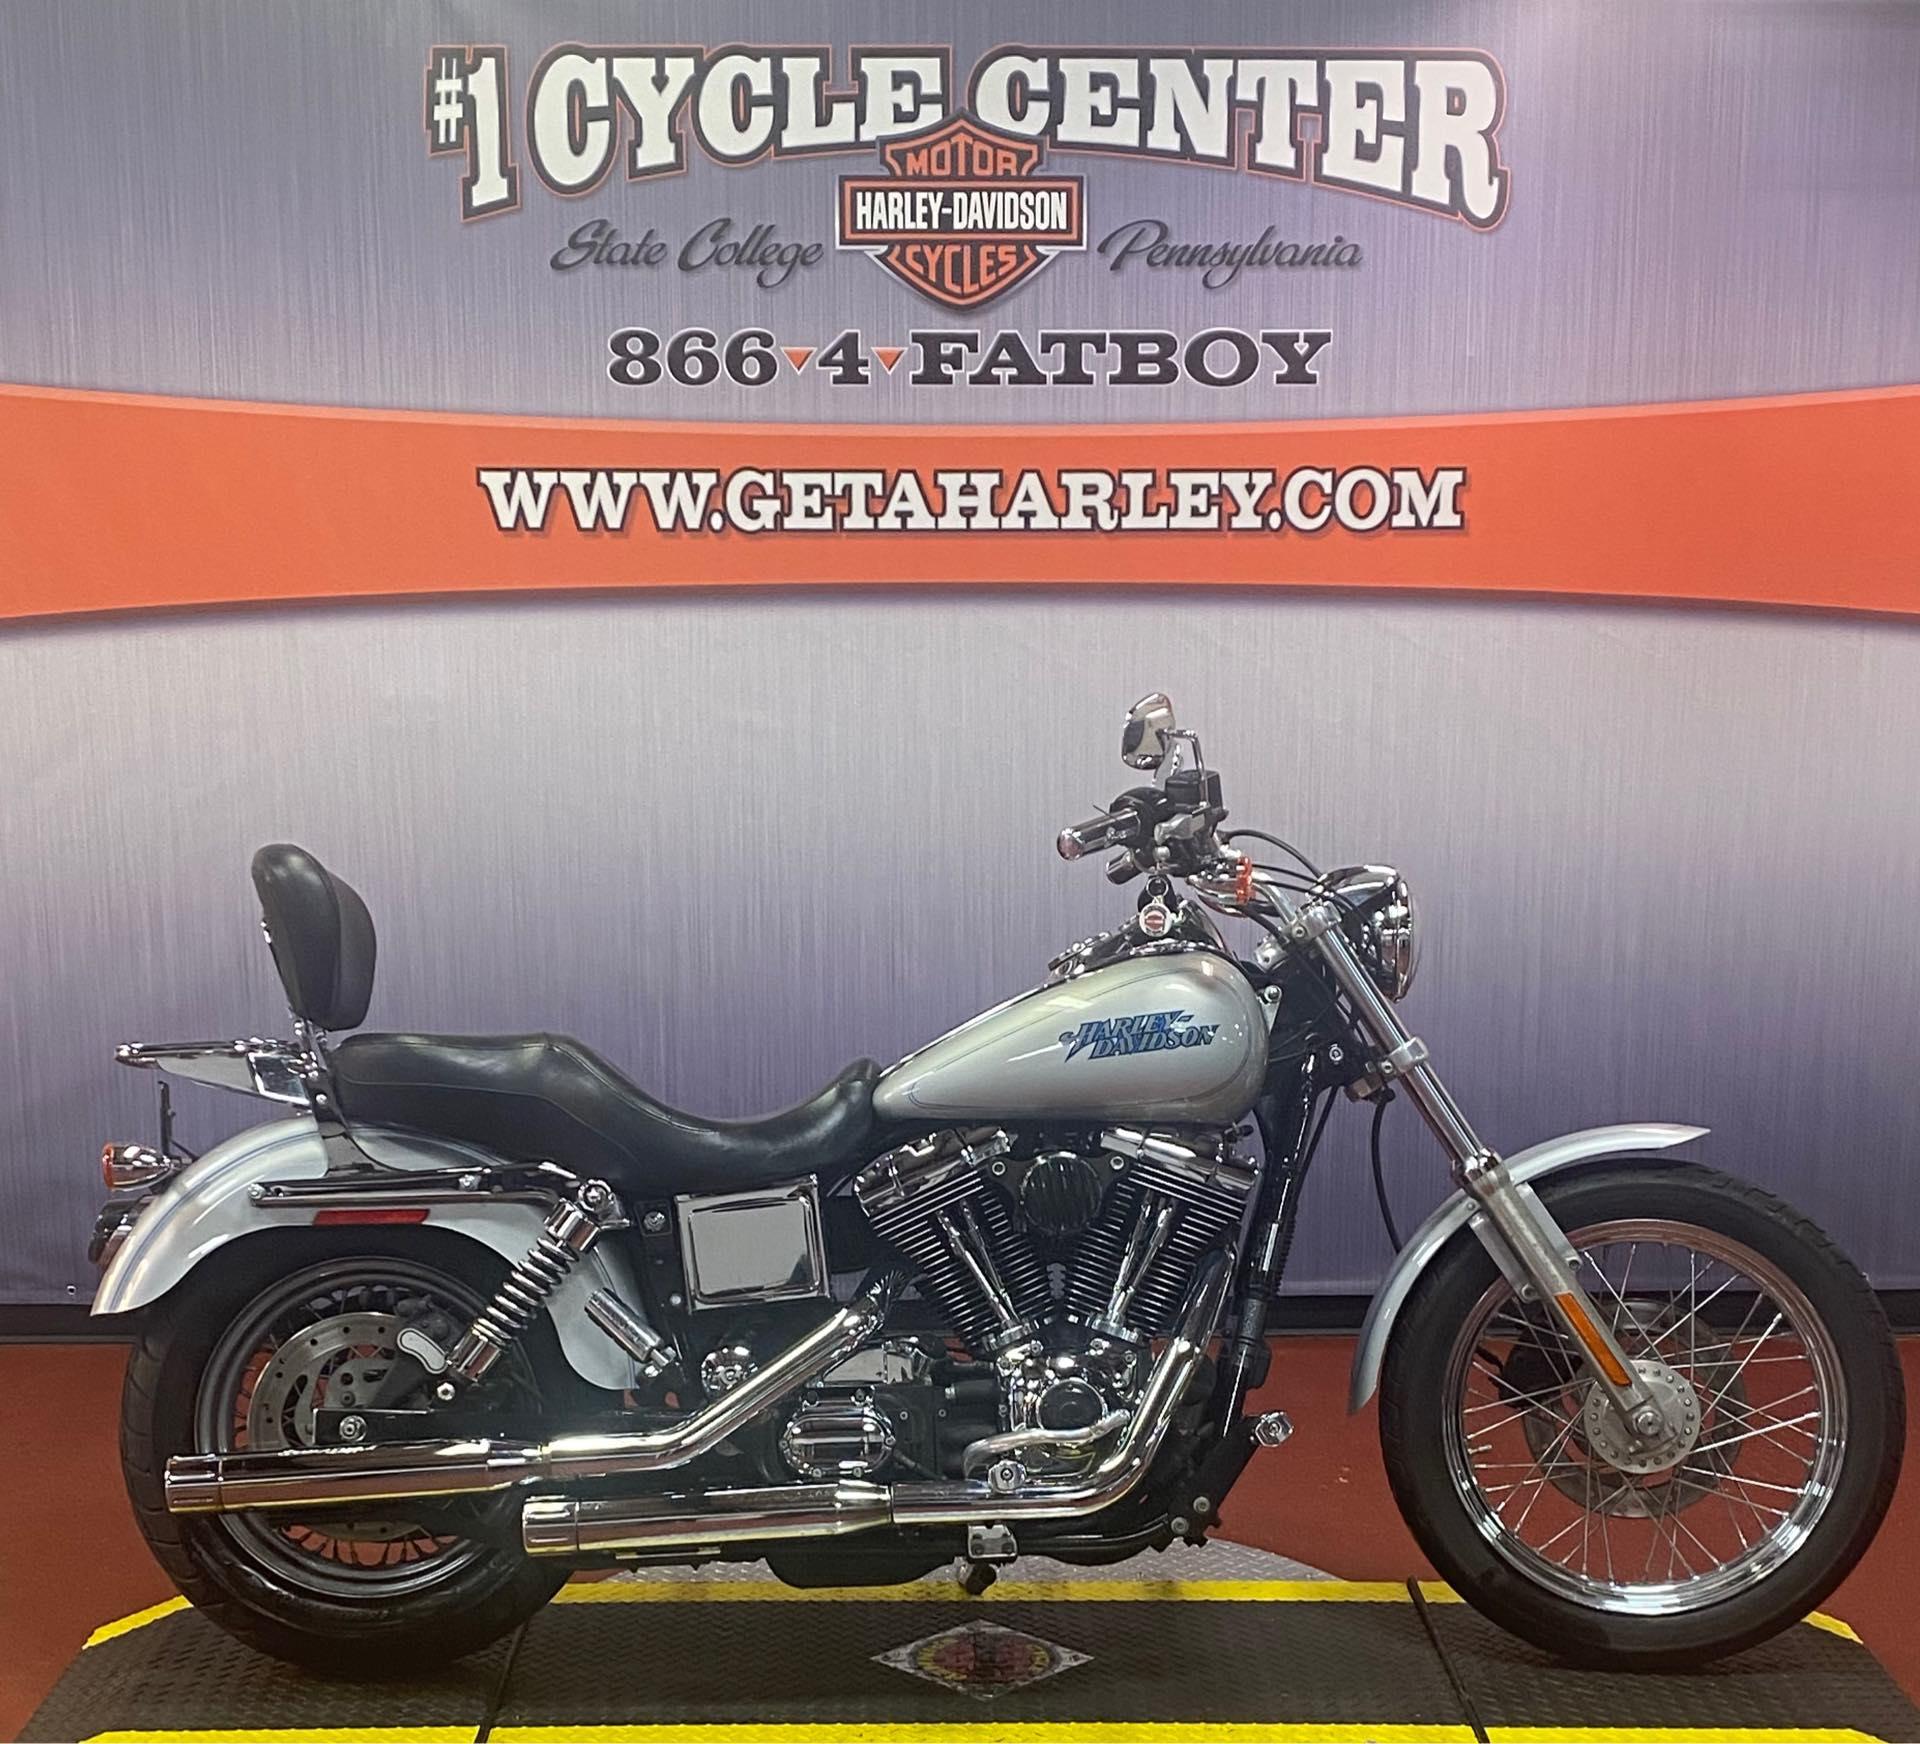 2005 Harley-Davidson FXDLI at #1 Cycle Center Harley-Davidson